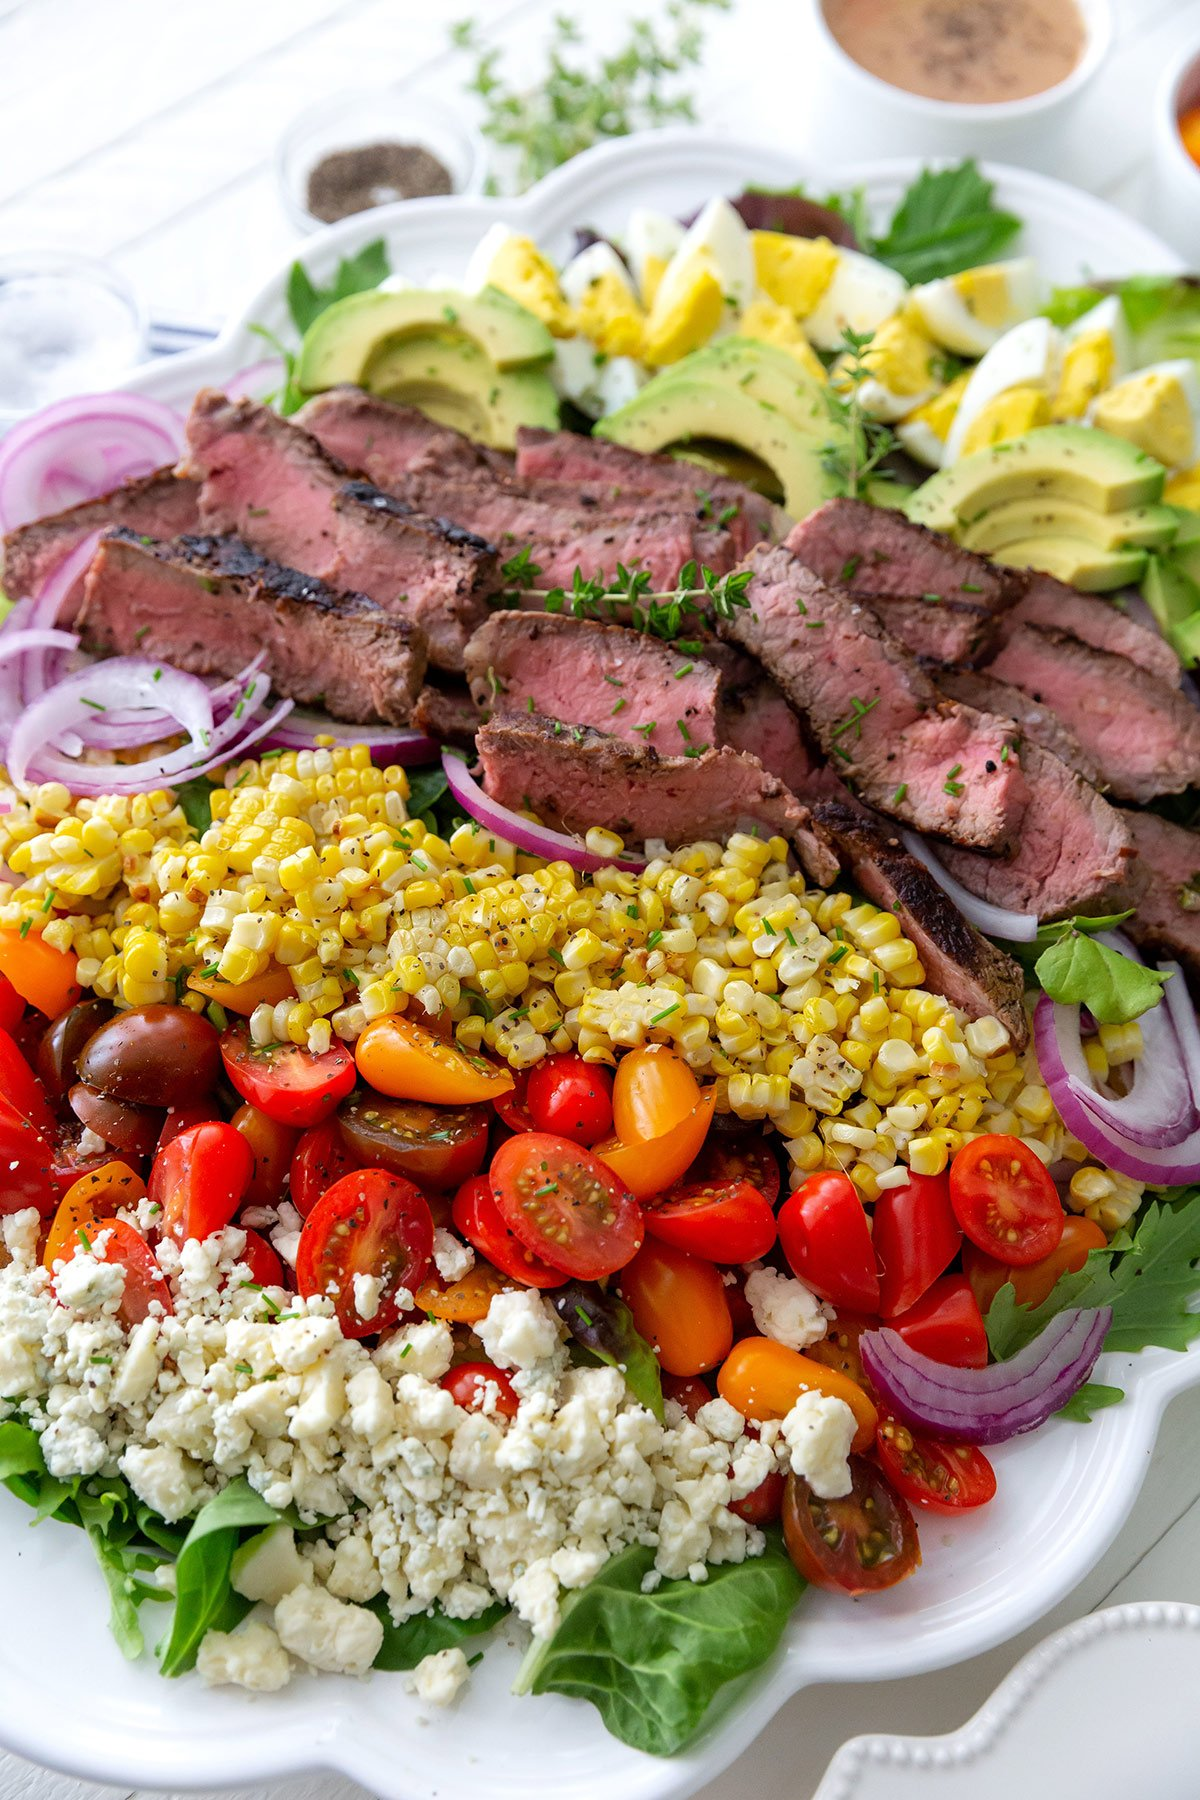 Entree Salad with Steak: Cobb Salad